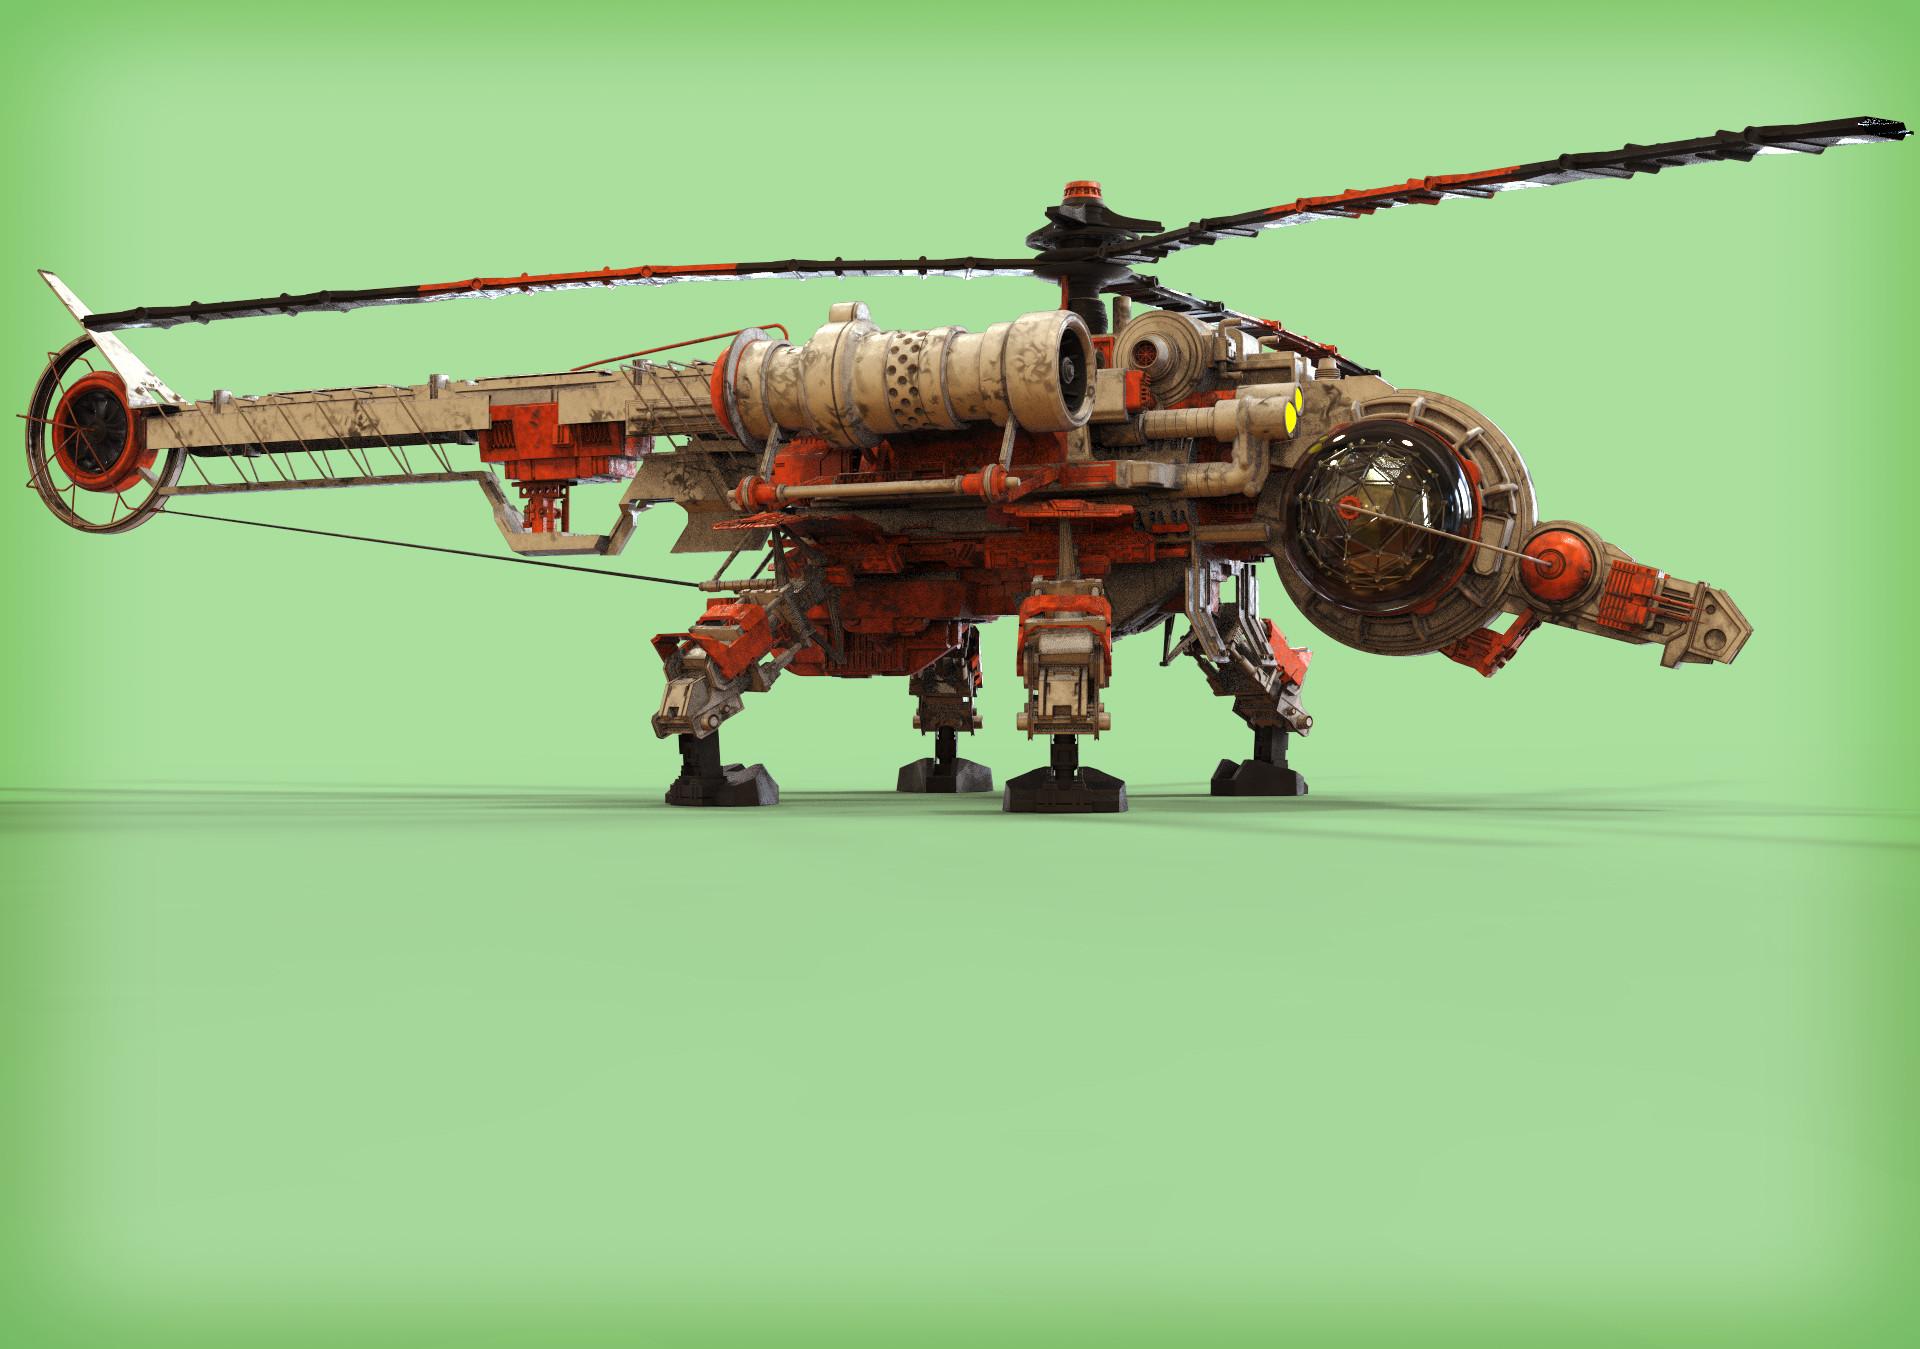 Ben nicholas bughelicopter 06